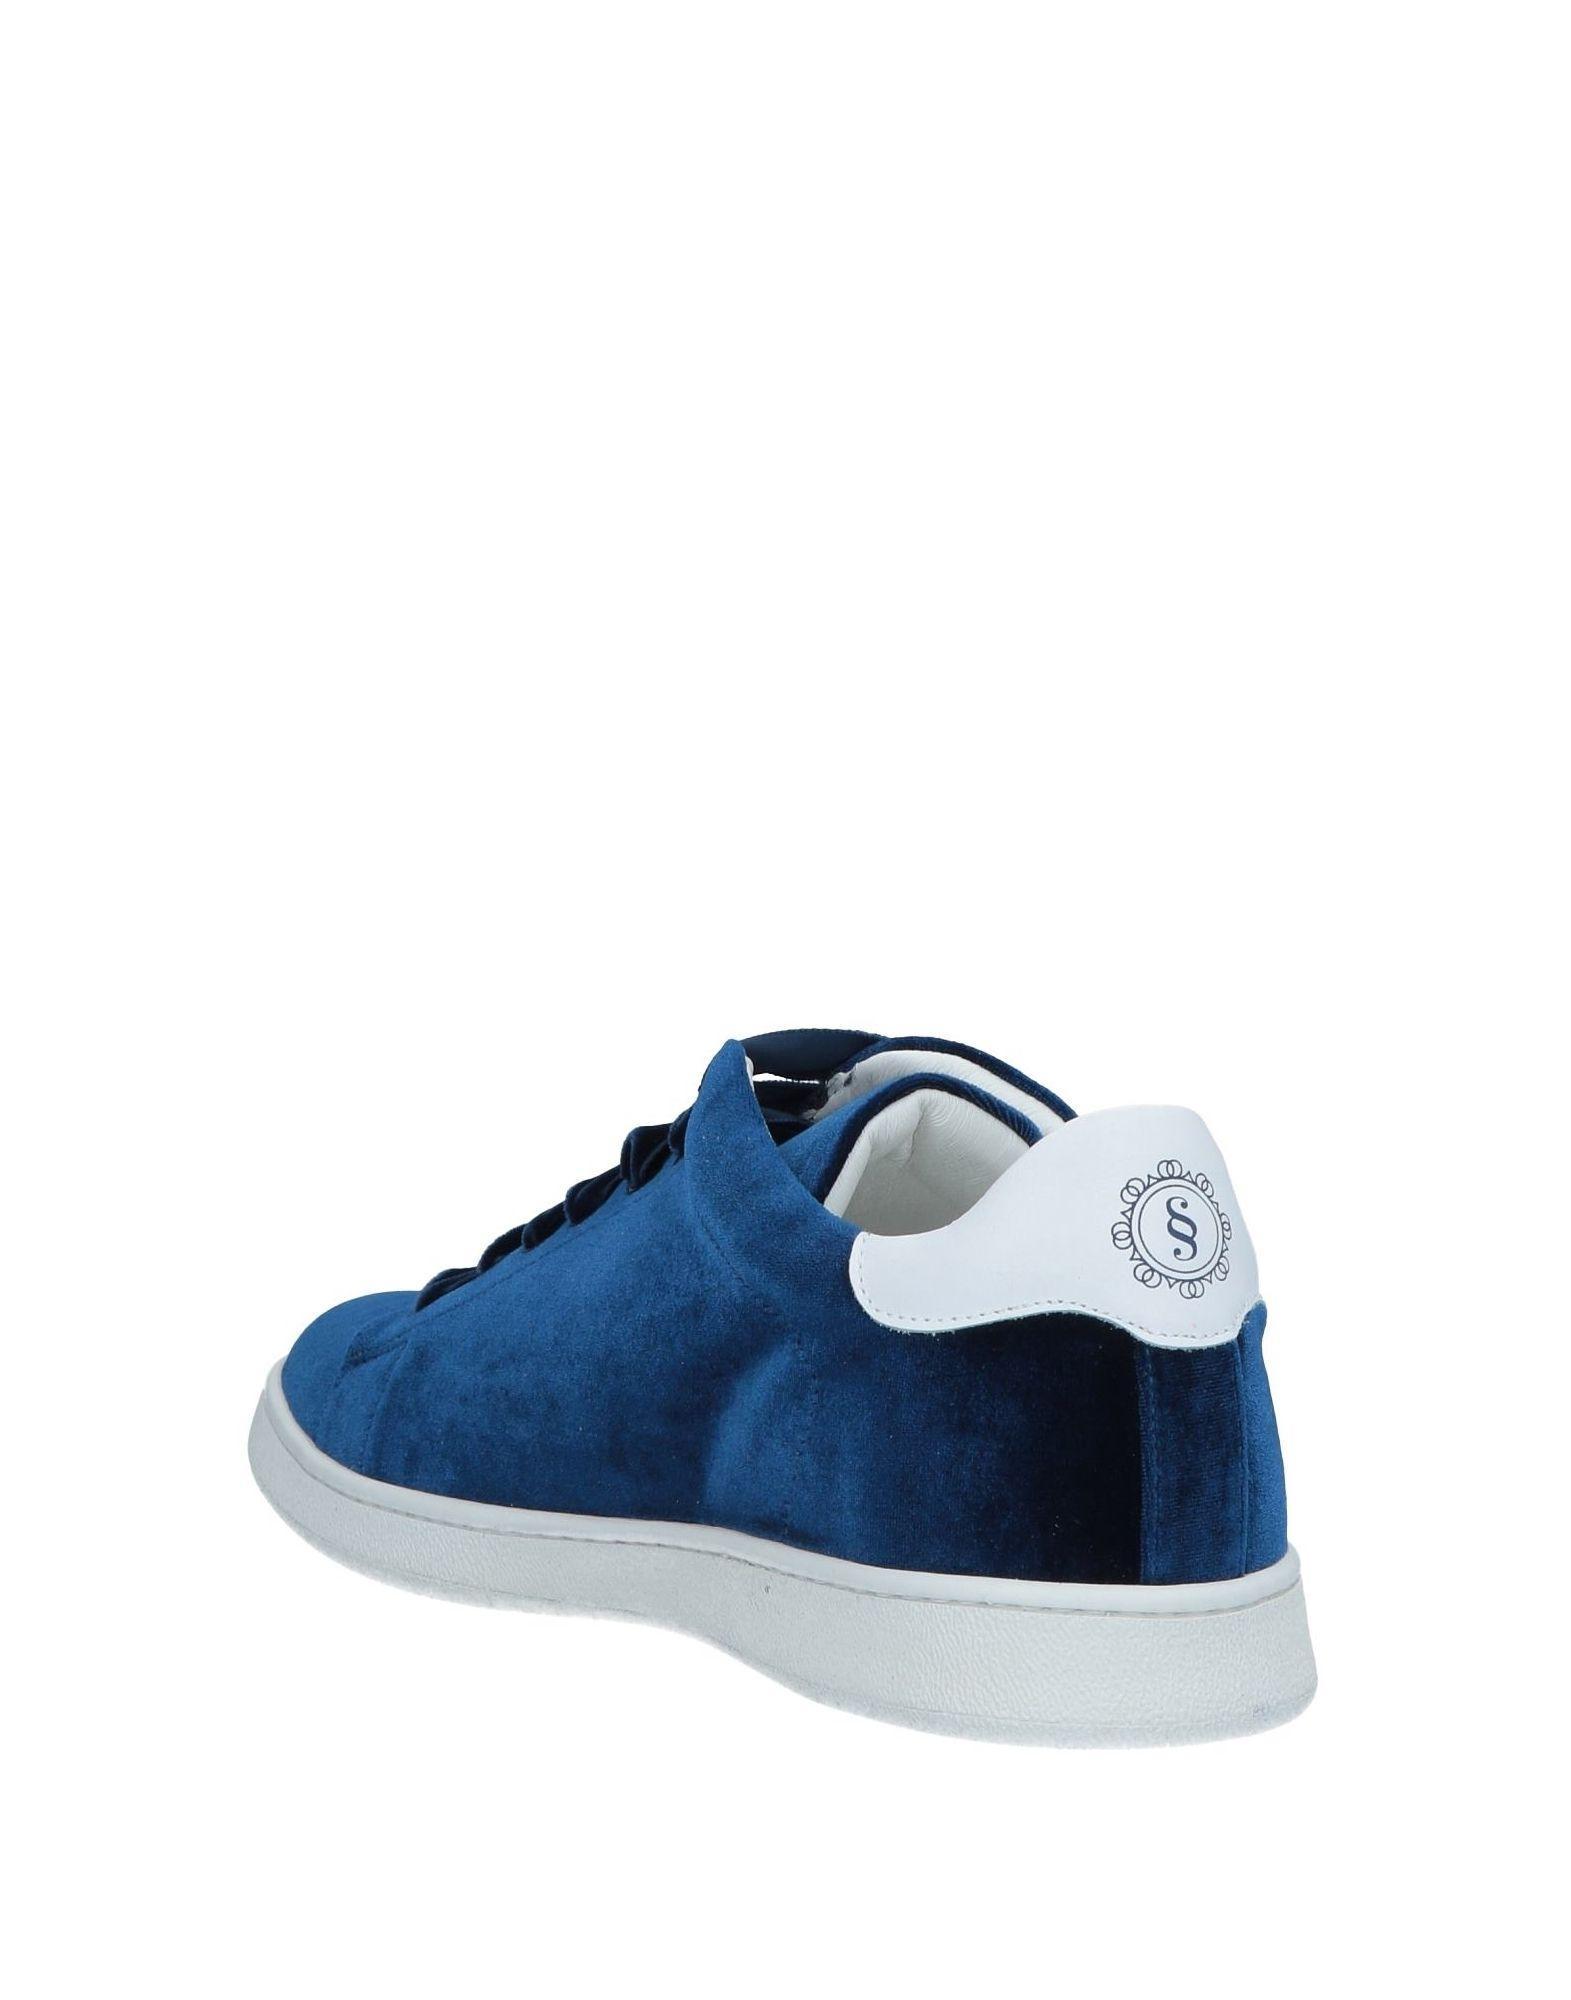 Sneakers & Deportivas Steve's de hombre de color Azul